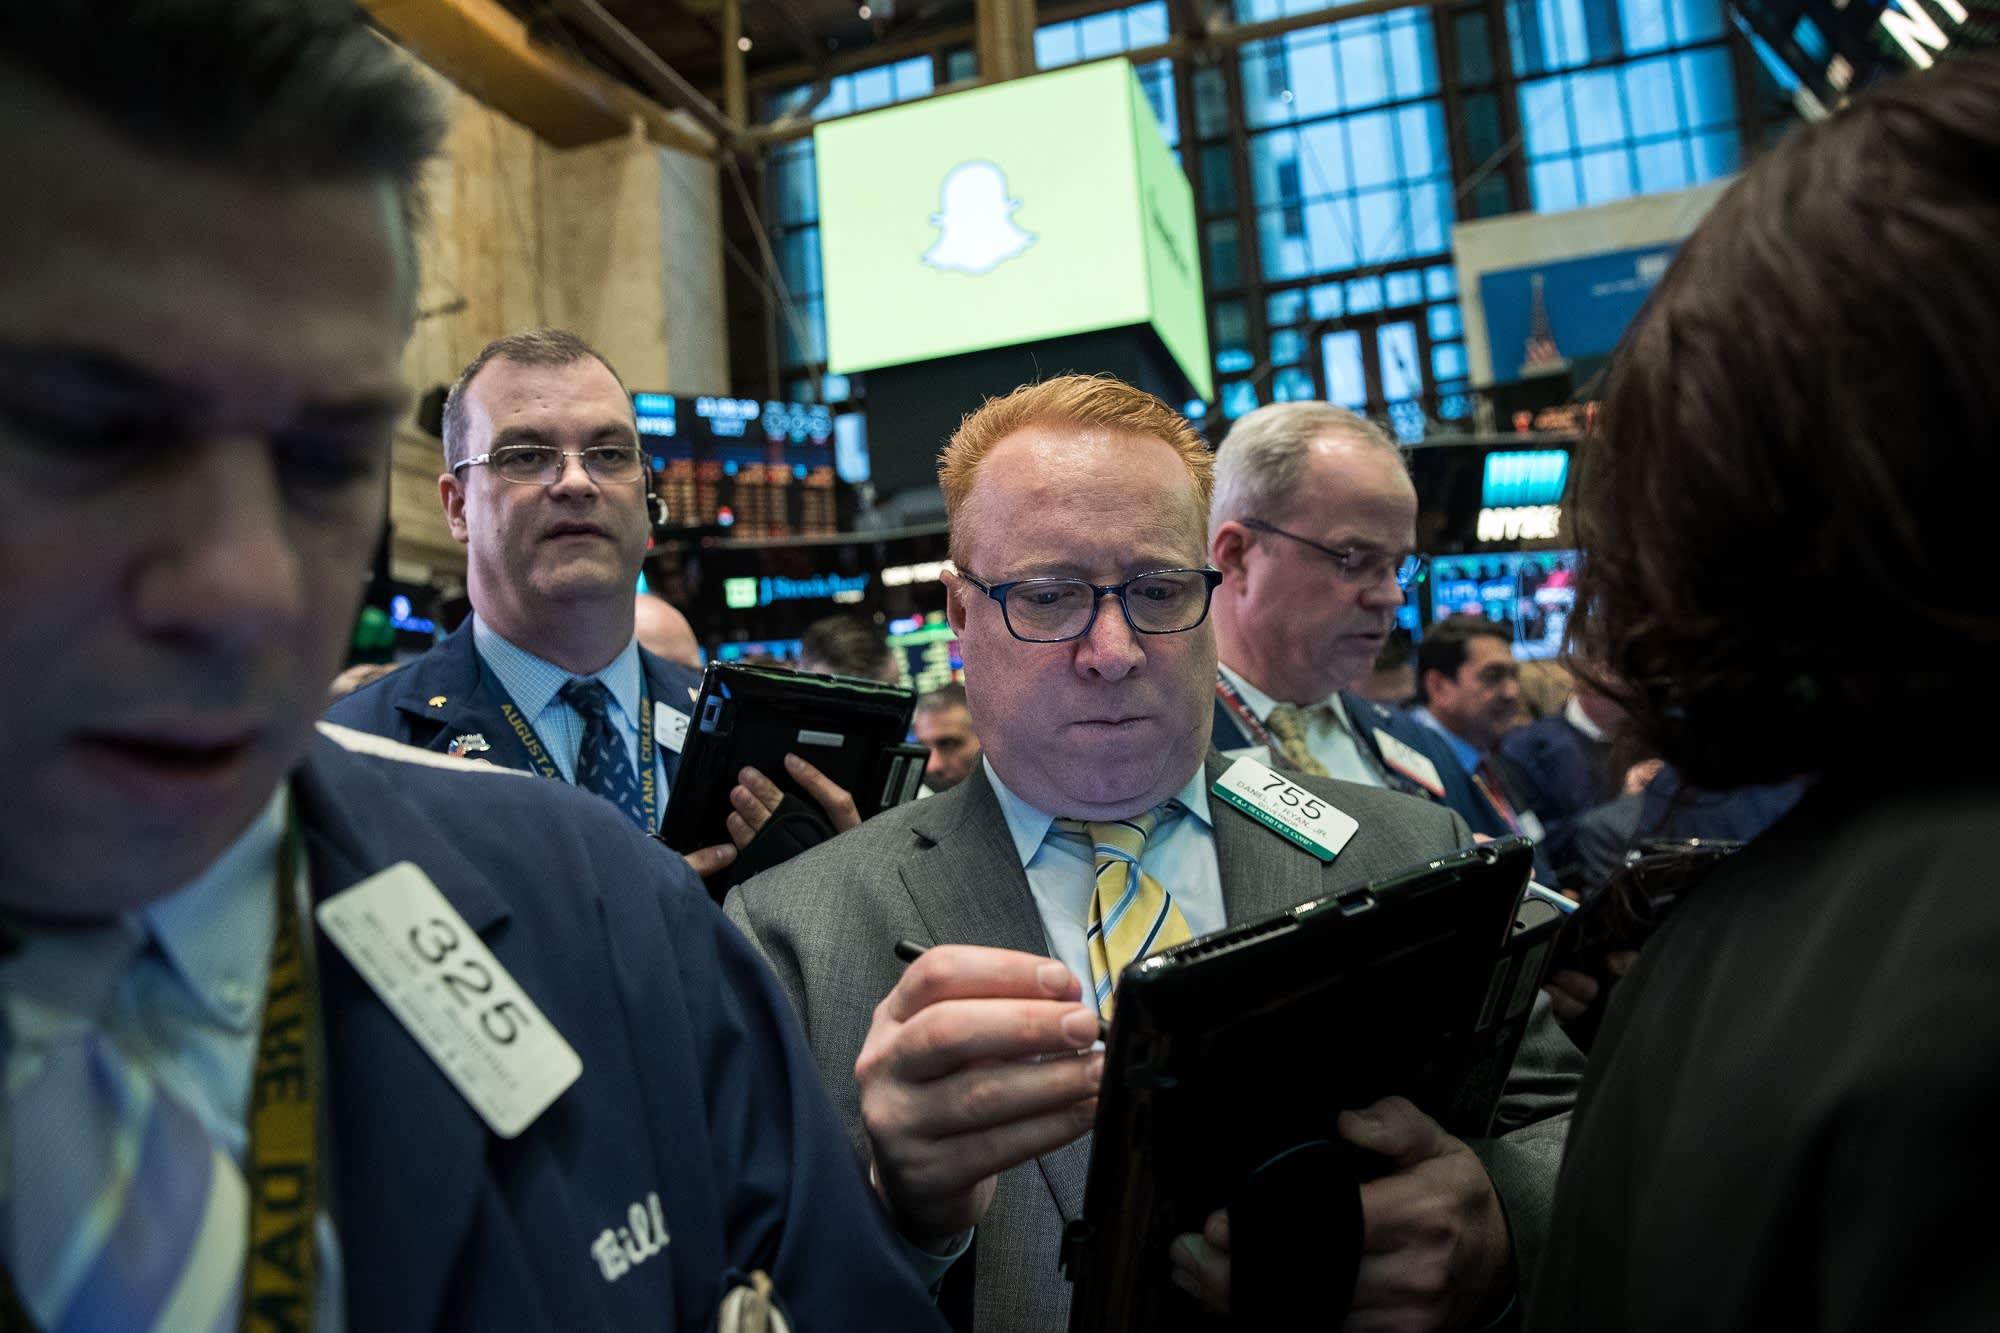 Stocks making the biggest moves premarket: Home Depot, Tesla, Kohl's, JC Penney, Merck & more